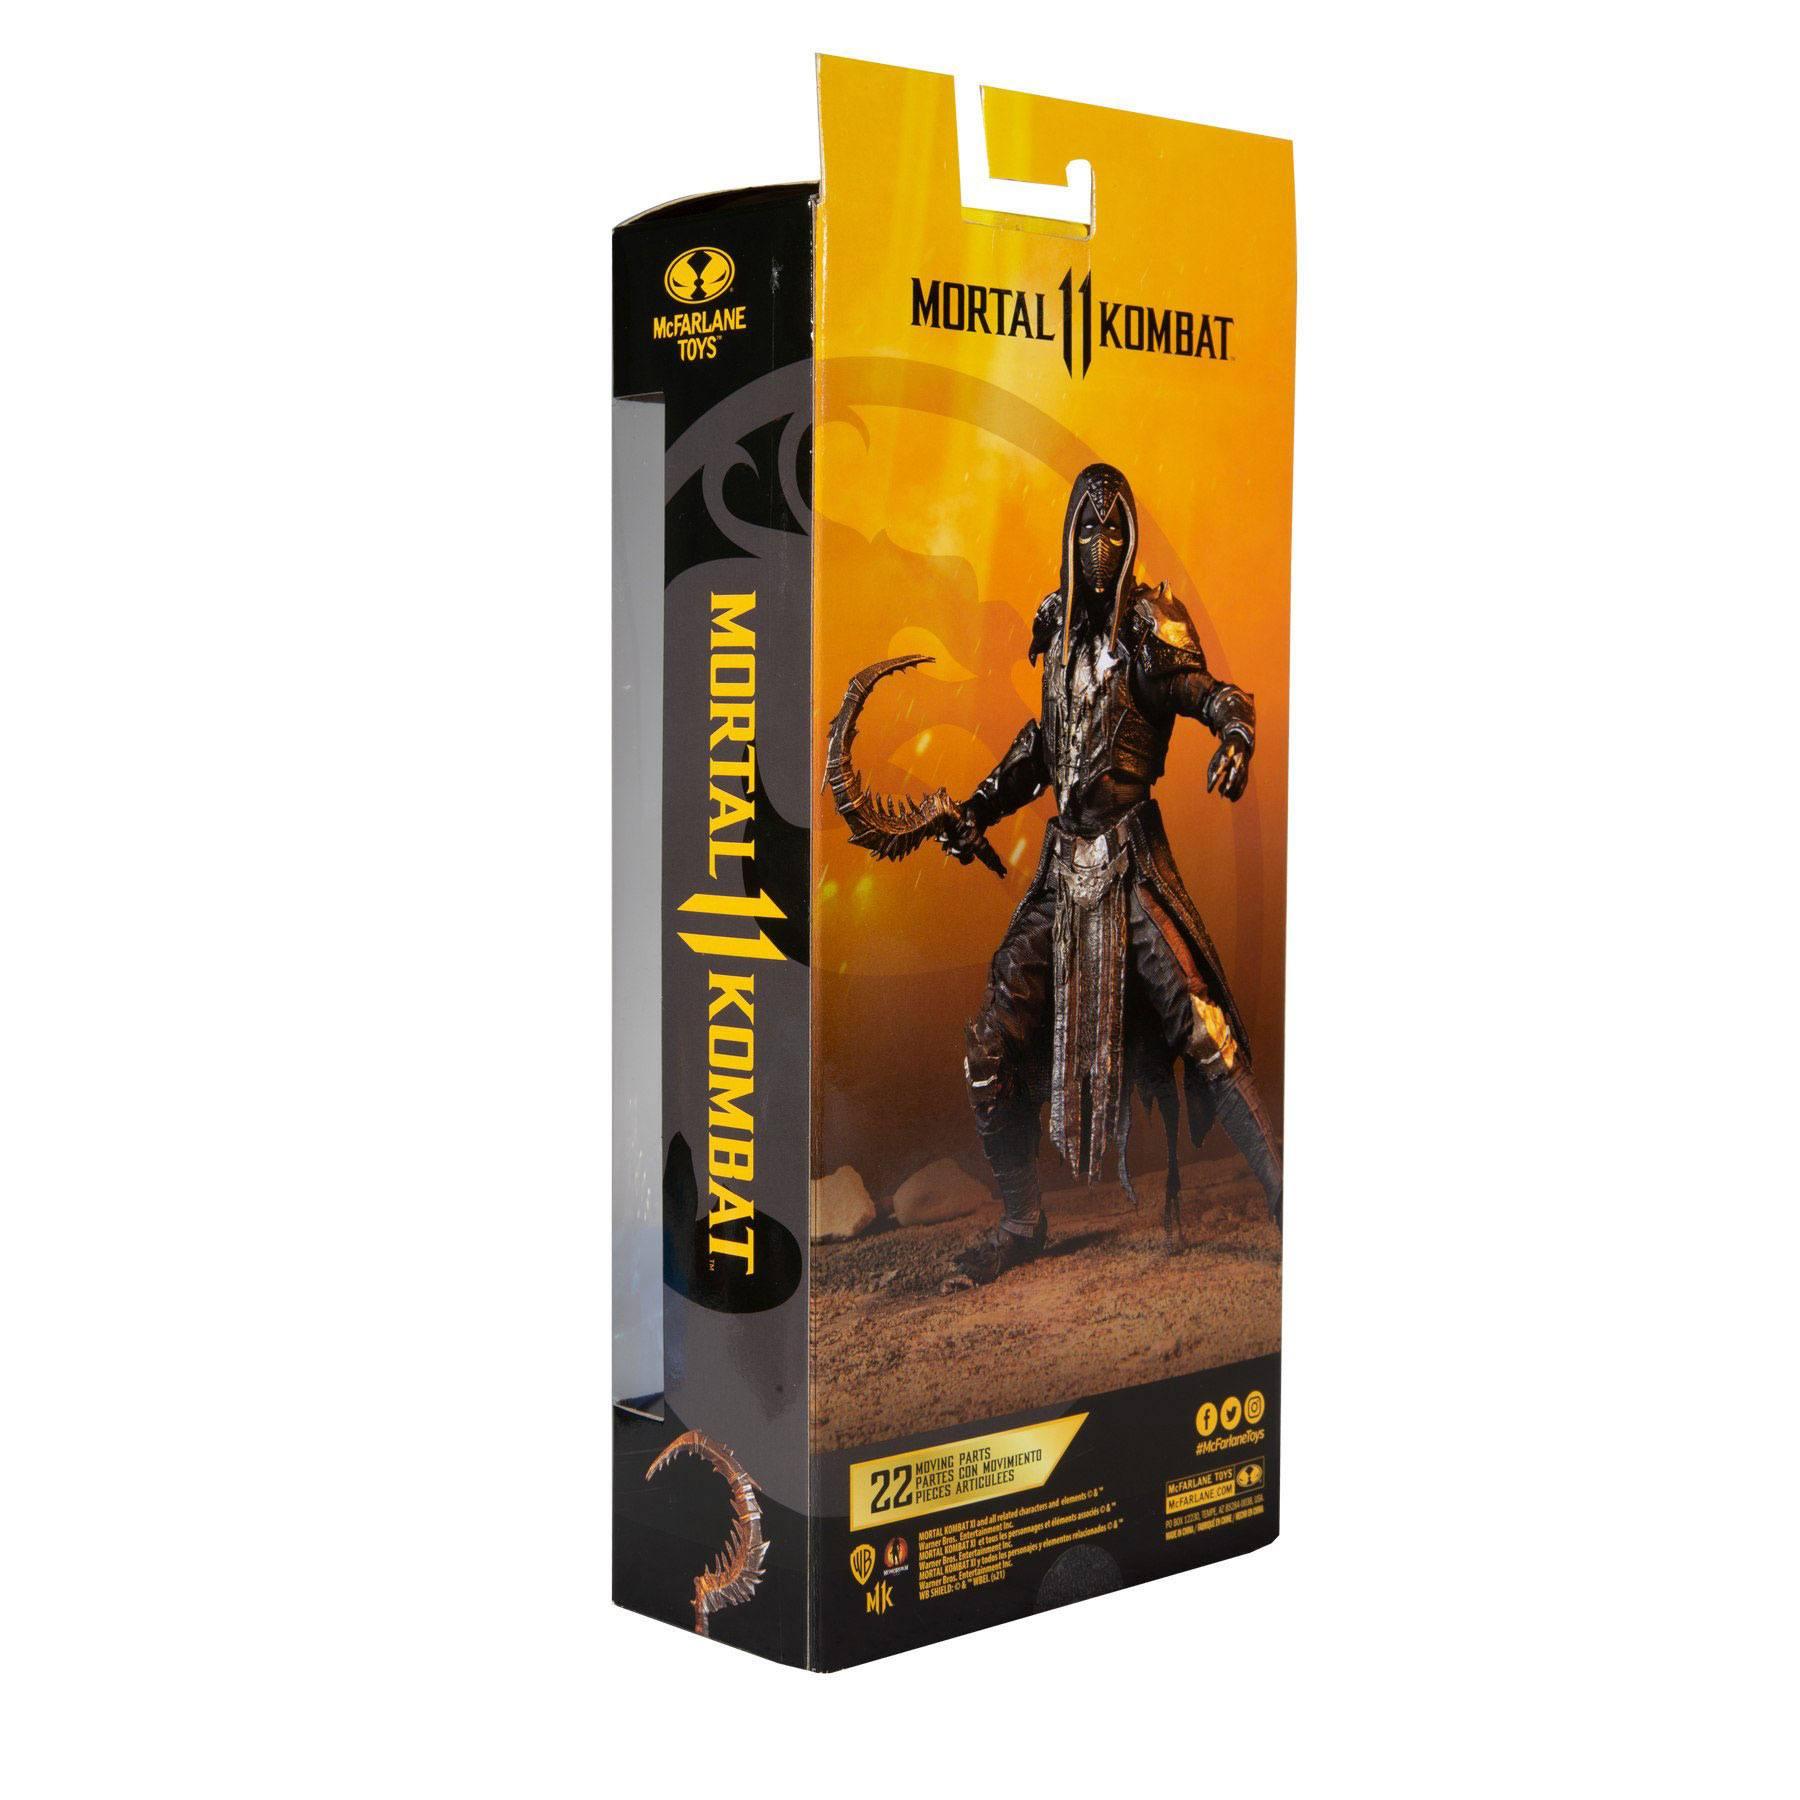 Mortal Kombat Actionfigur Noob Saibot: Kilgore Skin 18 cm MCF11046-3 787926110463